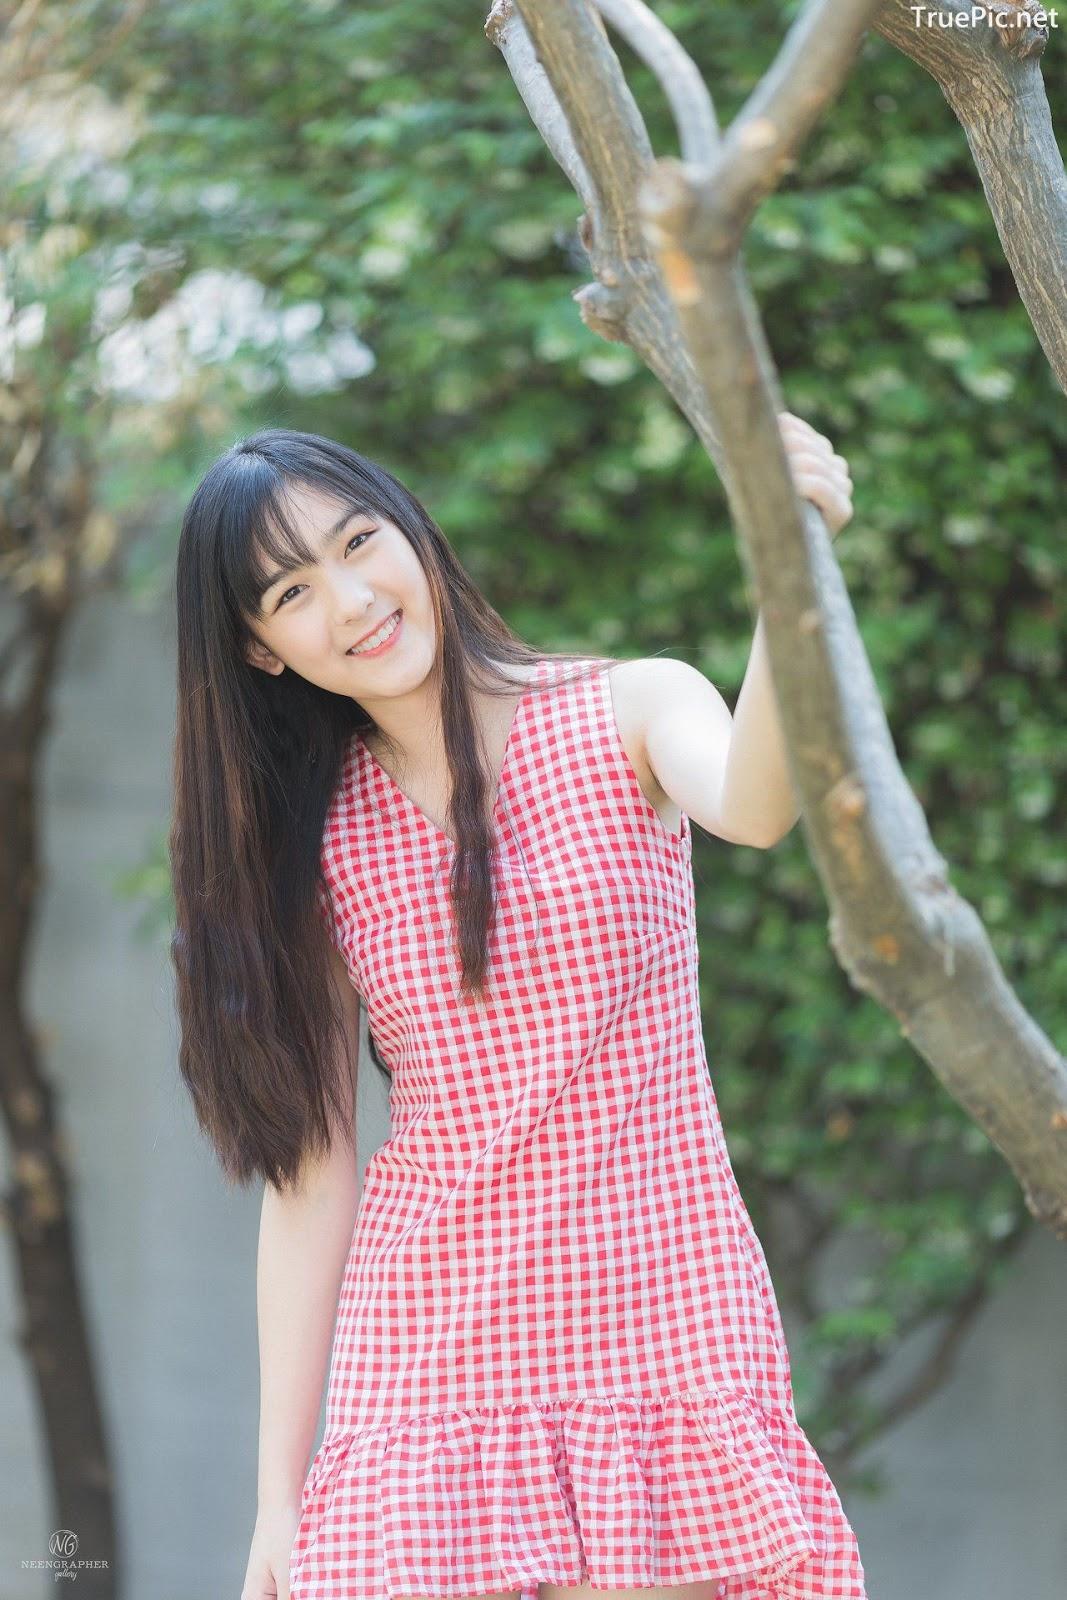 Image-Thailand-Cute-Model-Emma-Panisara–Album-Emma-Bright-Sunday-TruePic.net- Picture-16